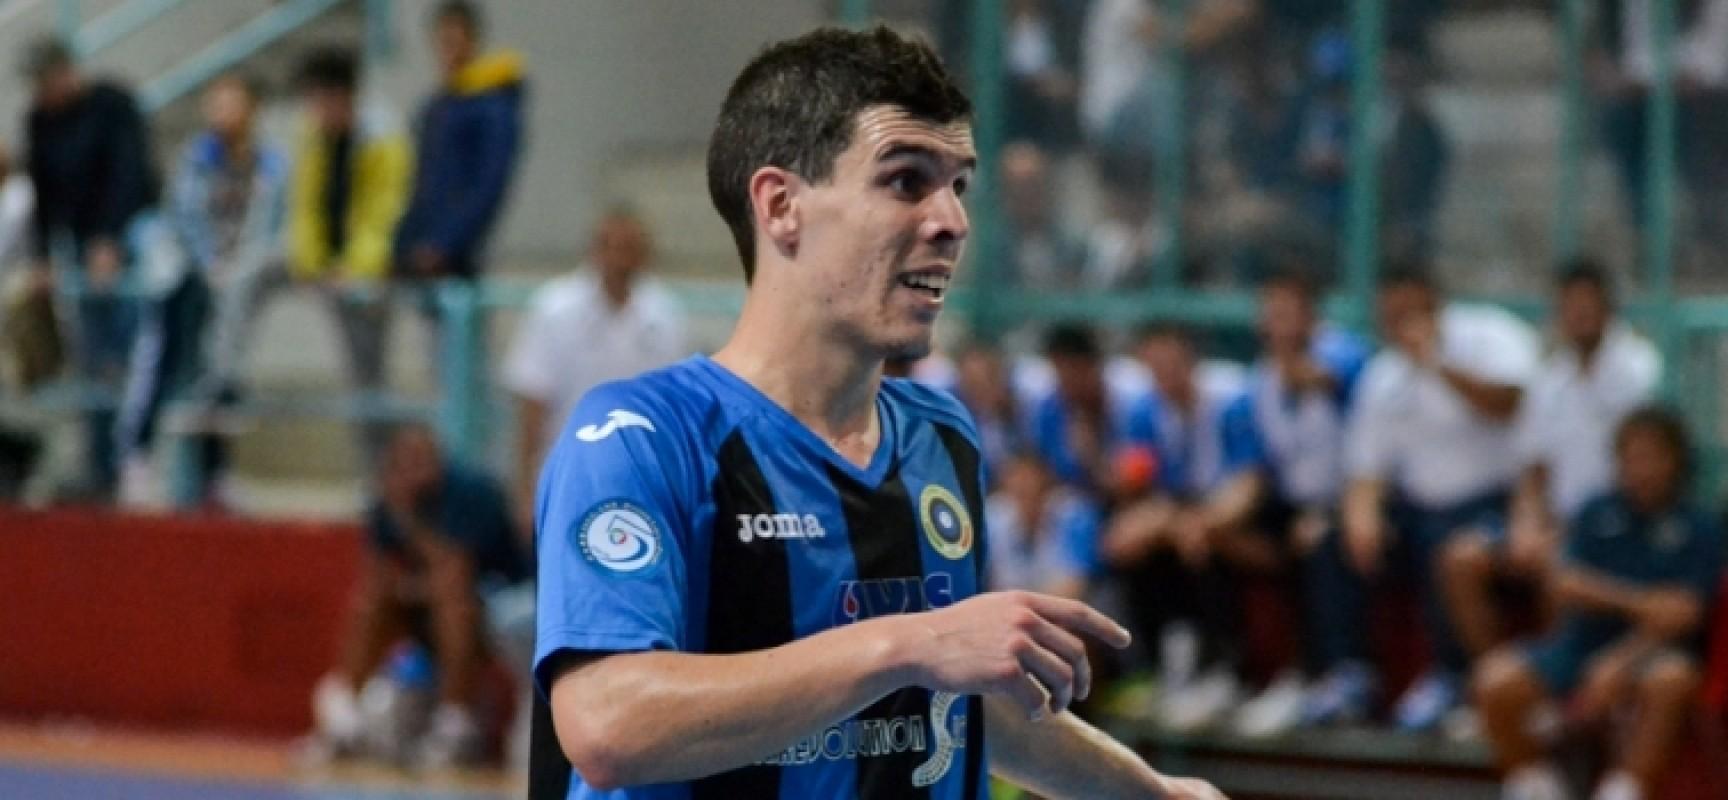 Goleada Futsal Bisceglie, 12 reti al CSG Putignano